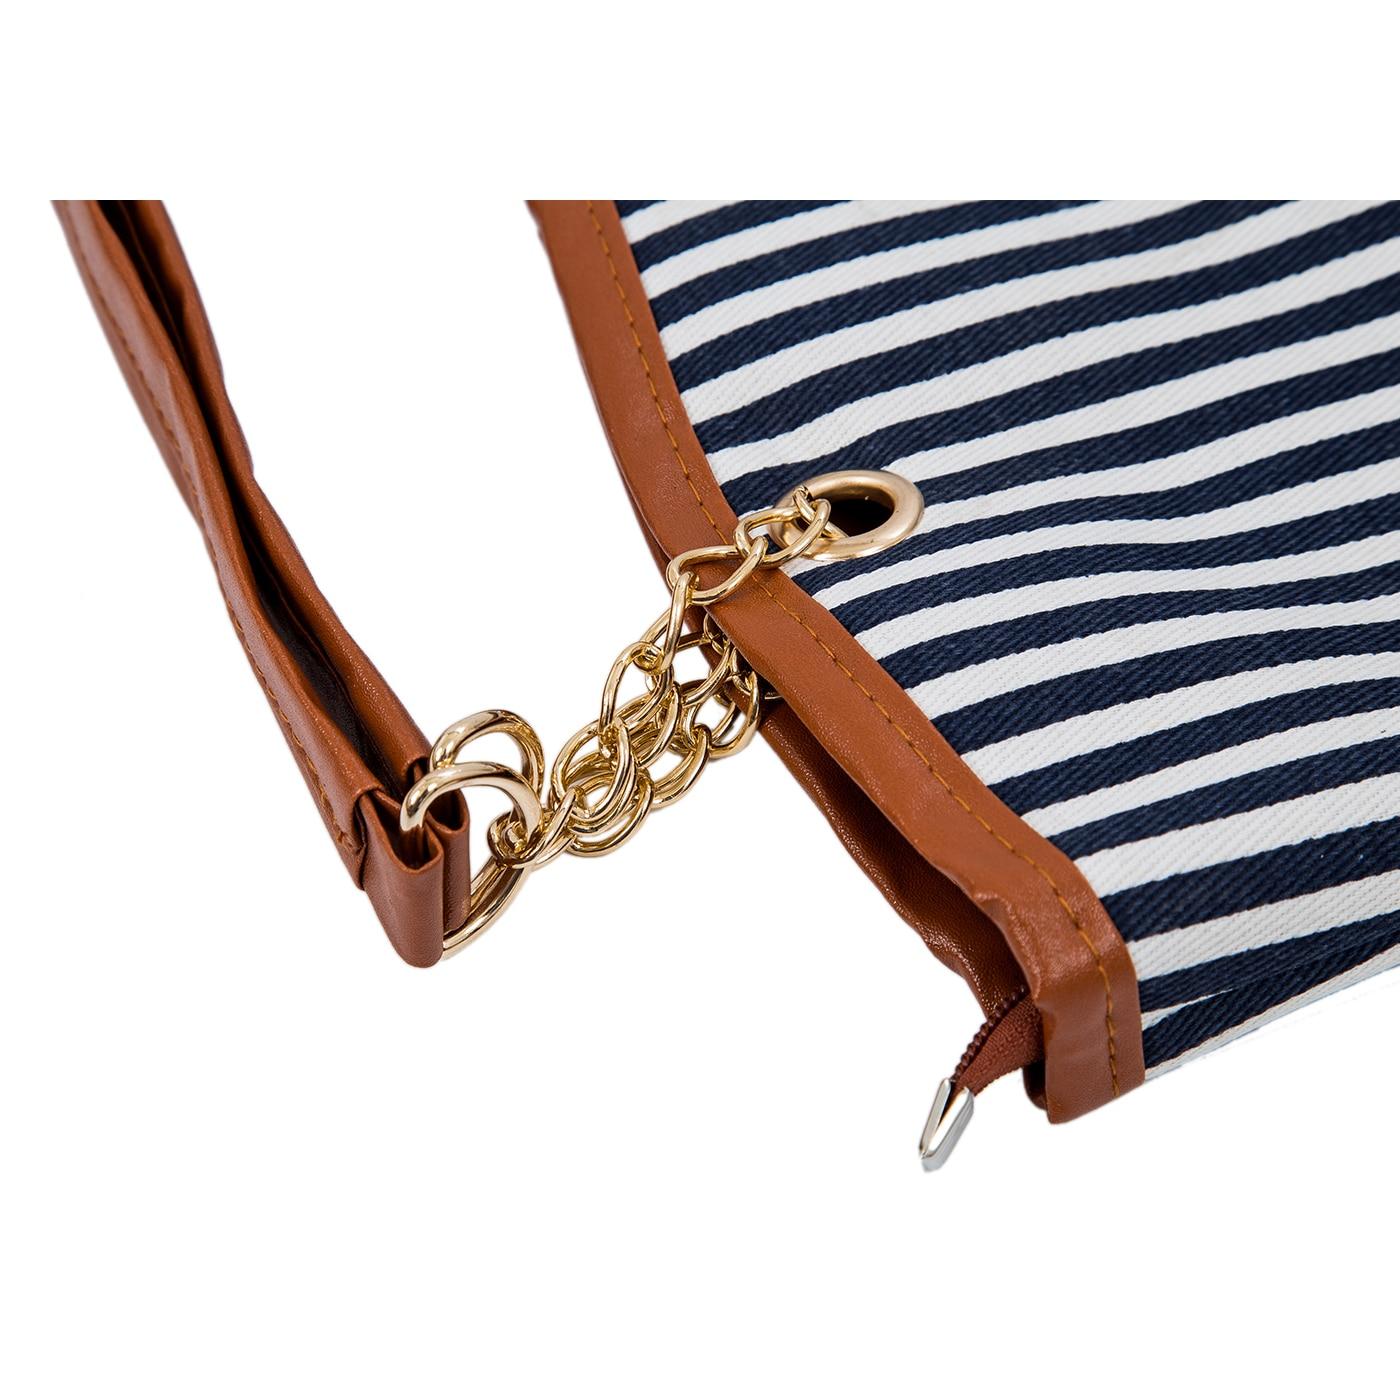 moda zipper tassel mulheres bolsa Exterior : Nenhum